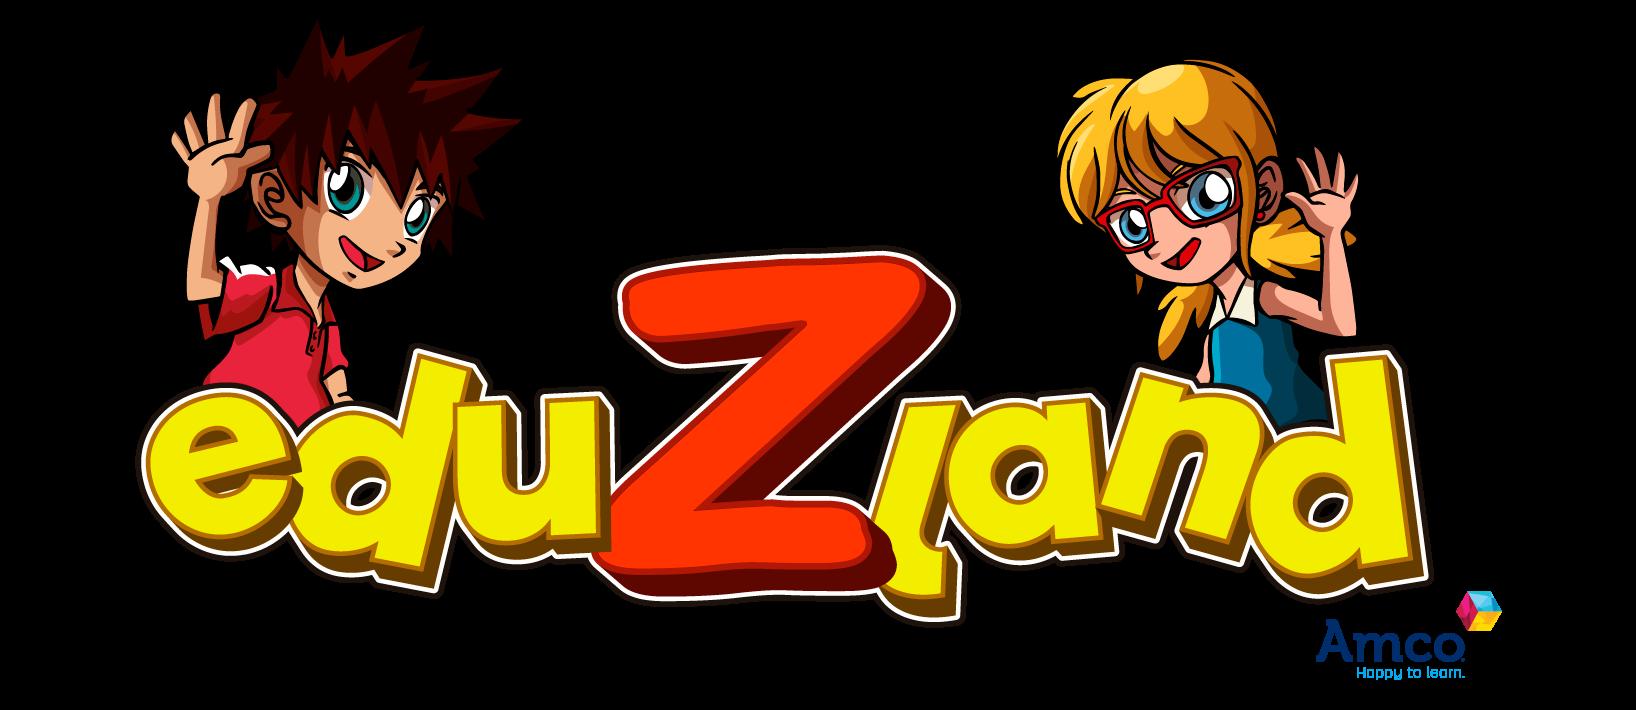 Logo-Eduzland_personajes